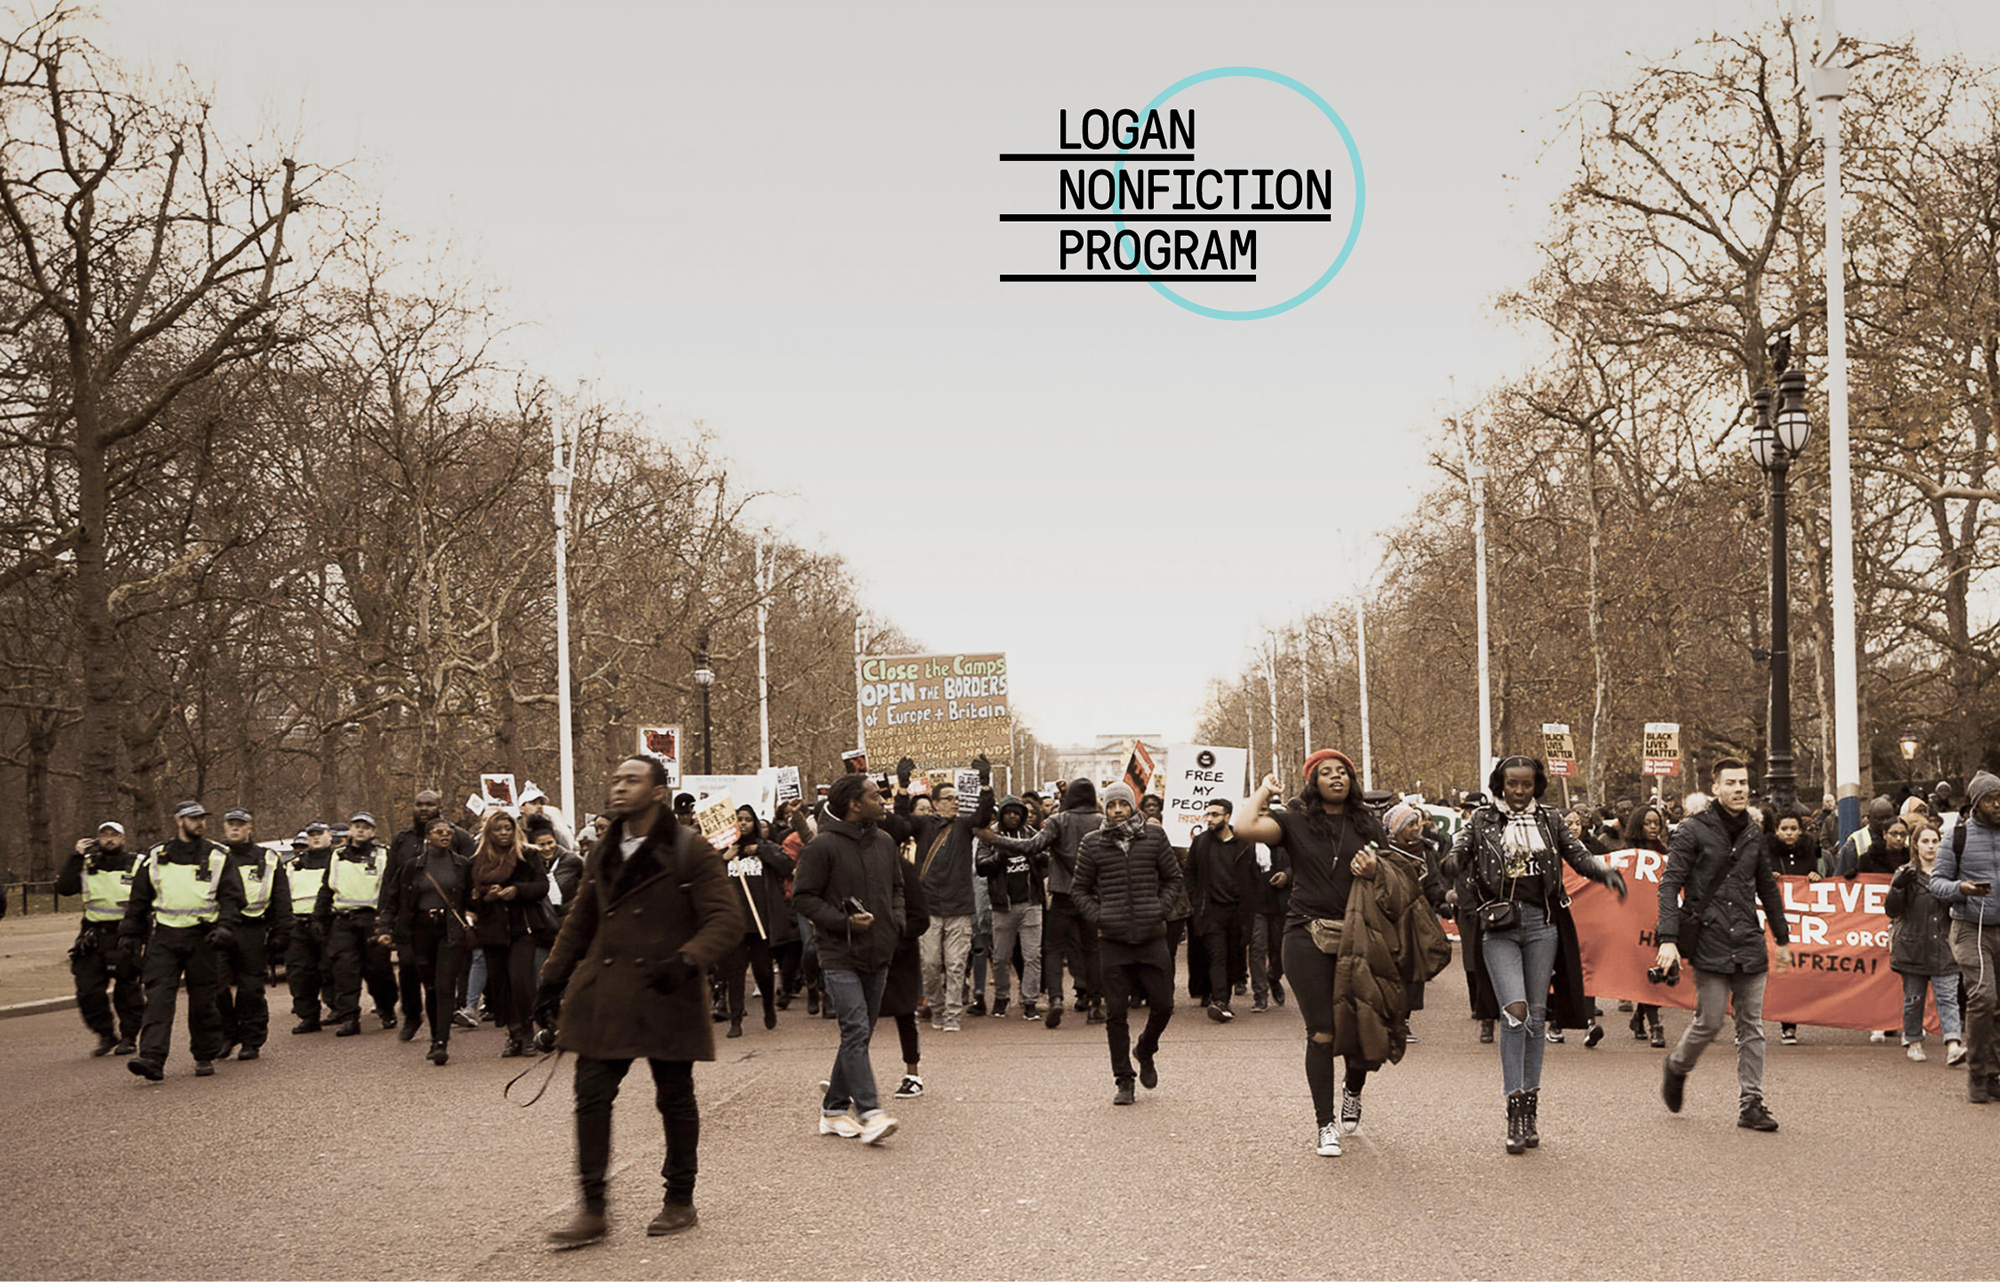 Logan_Non_fiction_Ambiance_Photo2.jpg